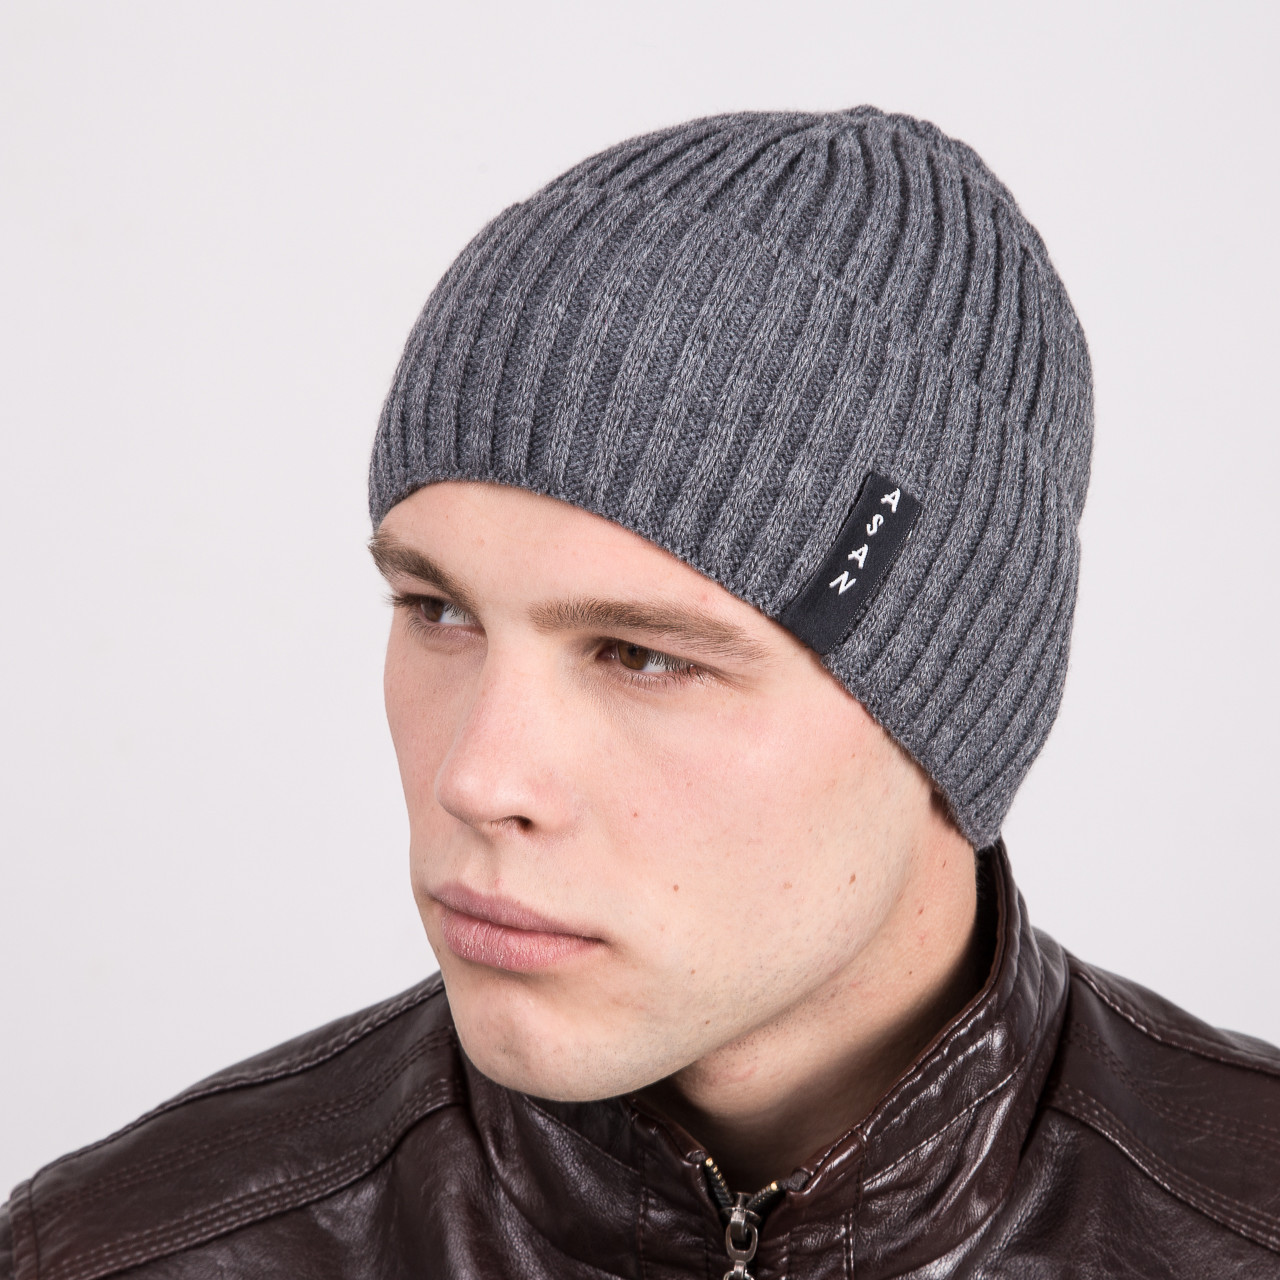 Вязаная мужская шапка с отворотом - Артикул m3a